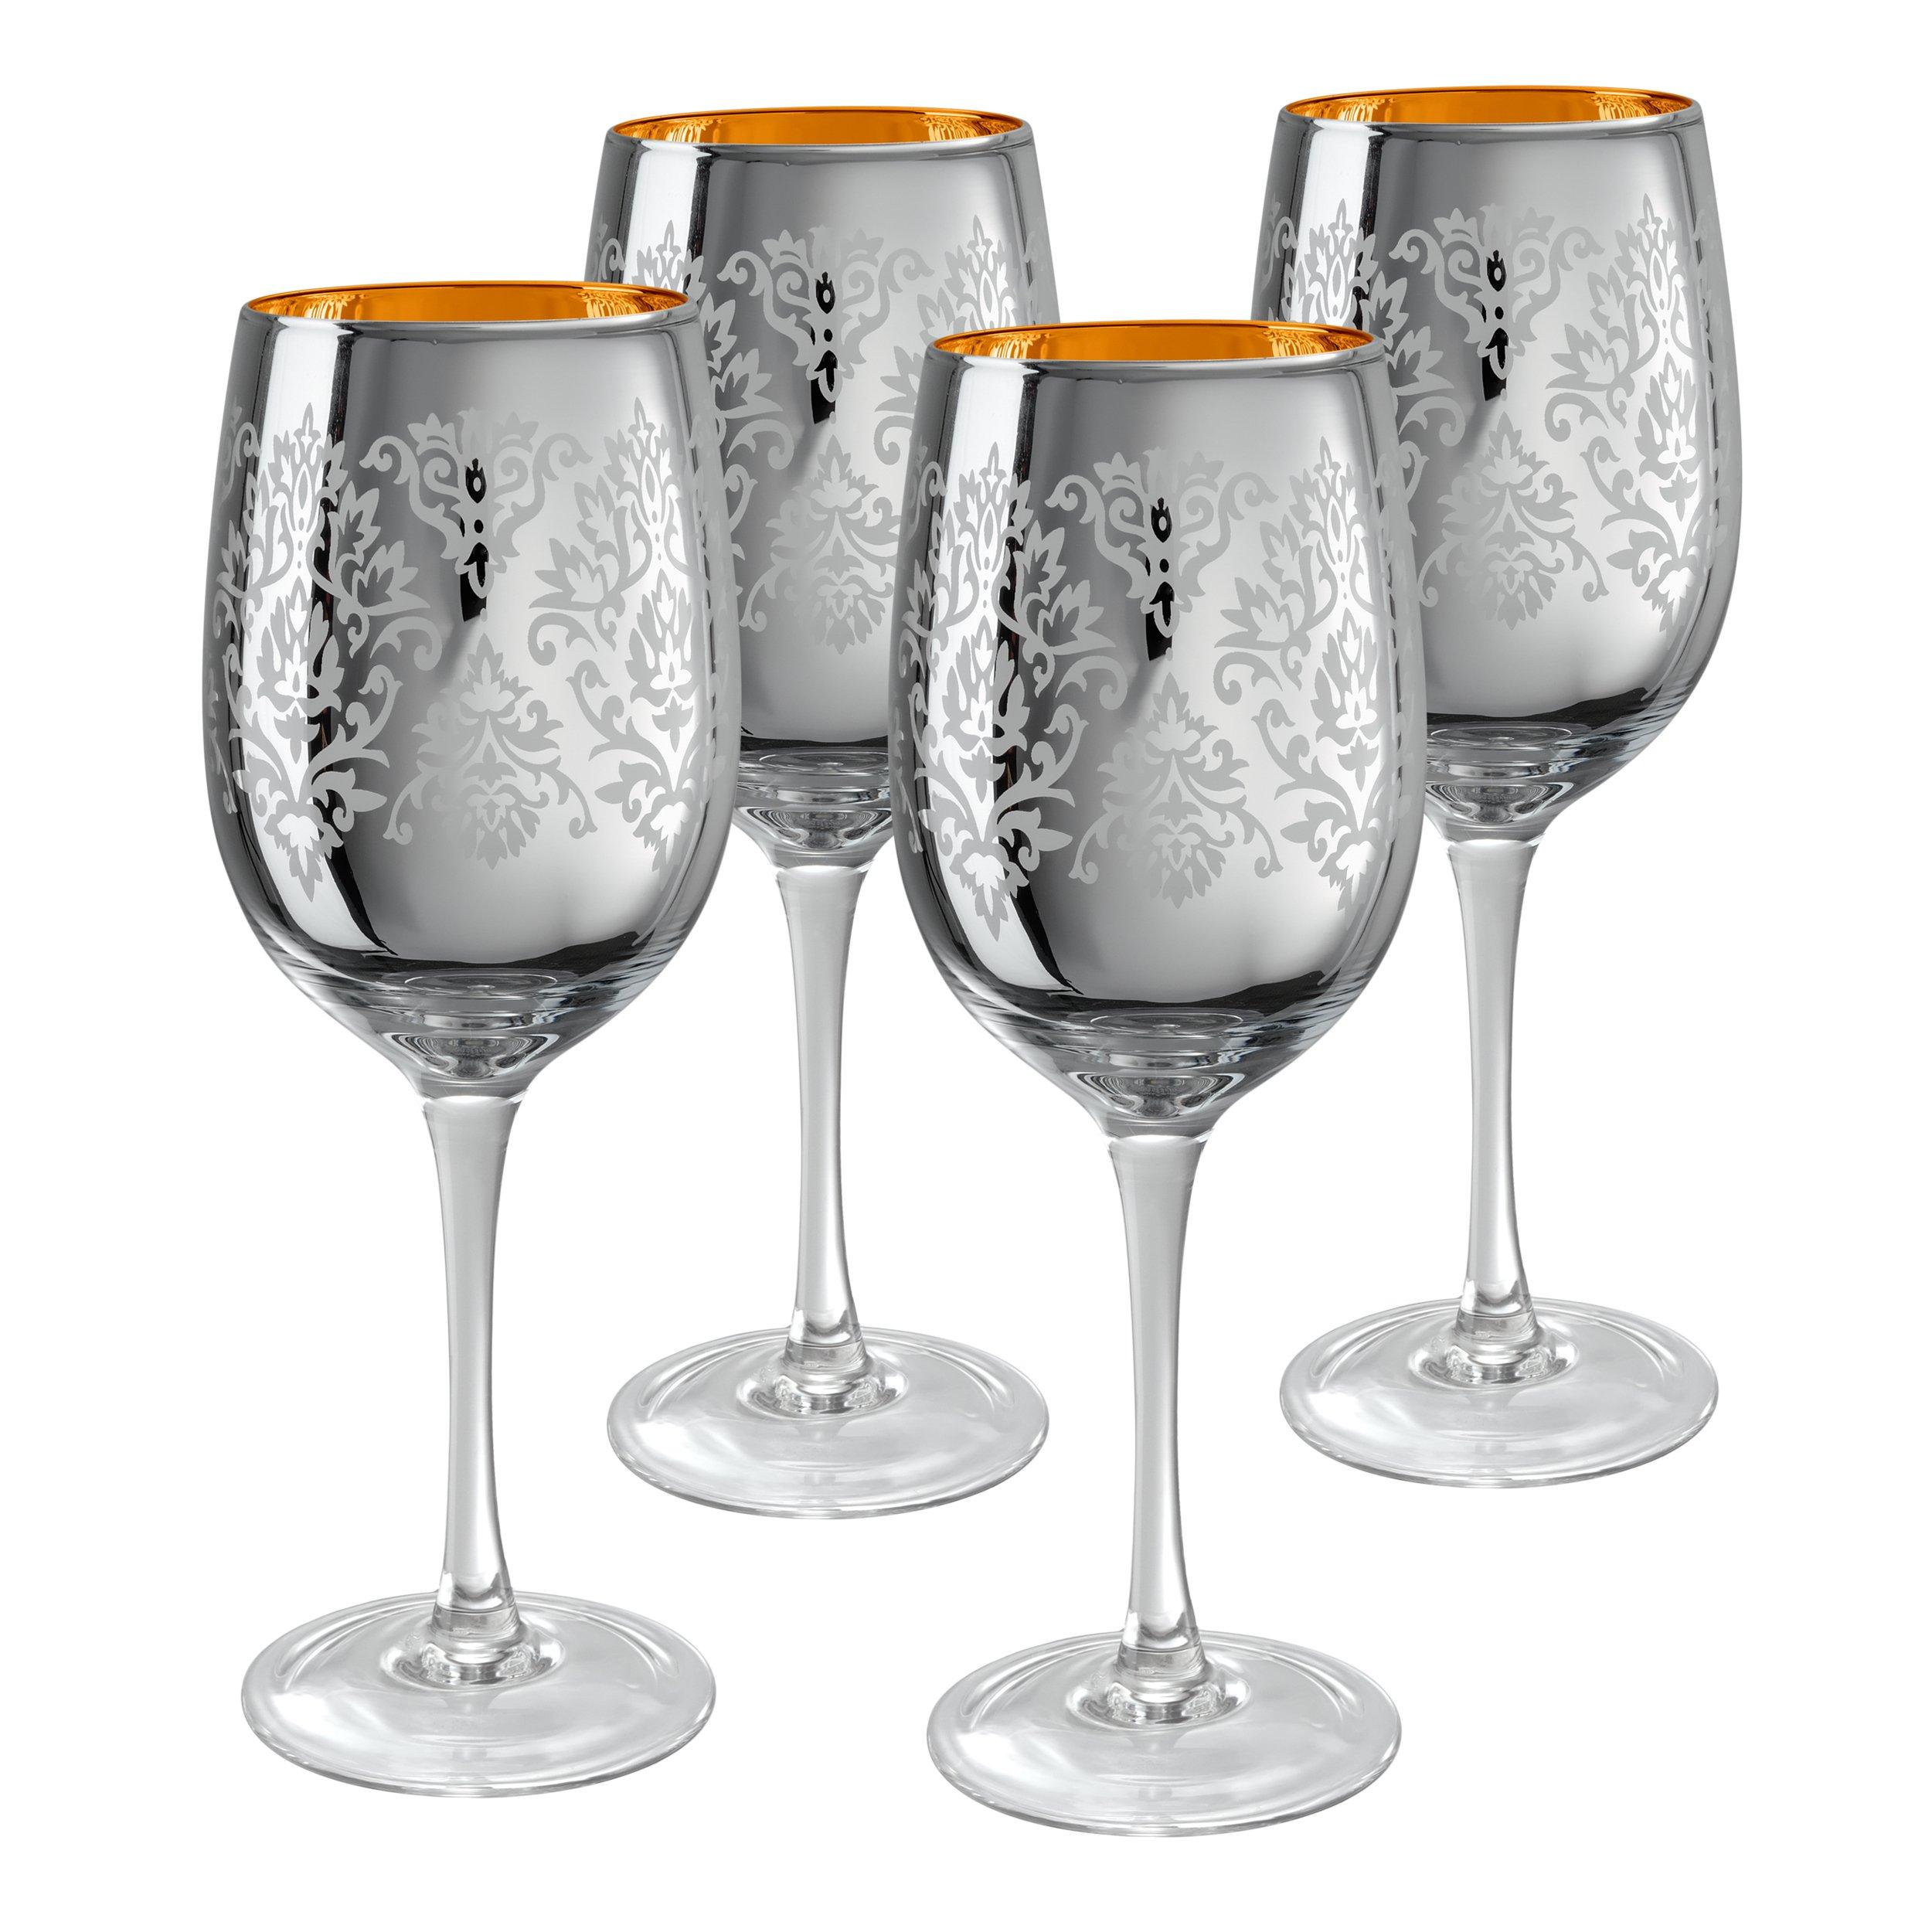 Artland Brocade Wine Glass, 15 oz, Silver, Set of 4 by Artland (Image #1)